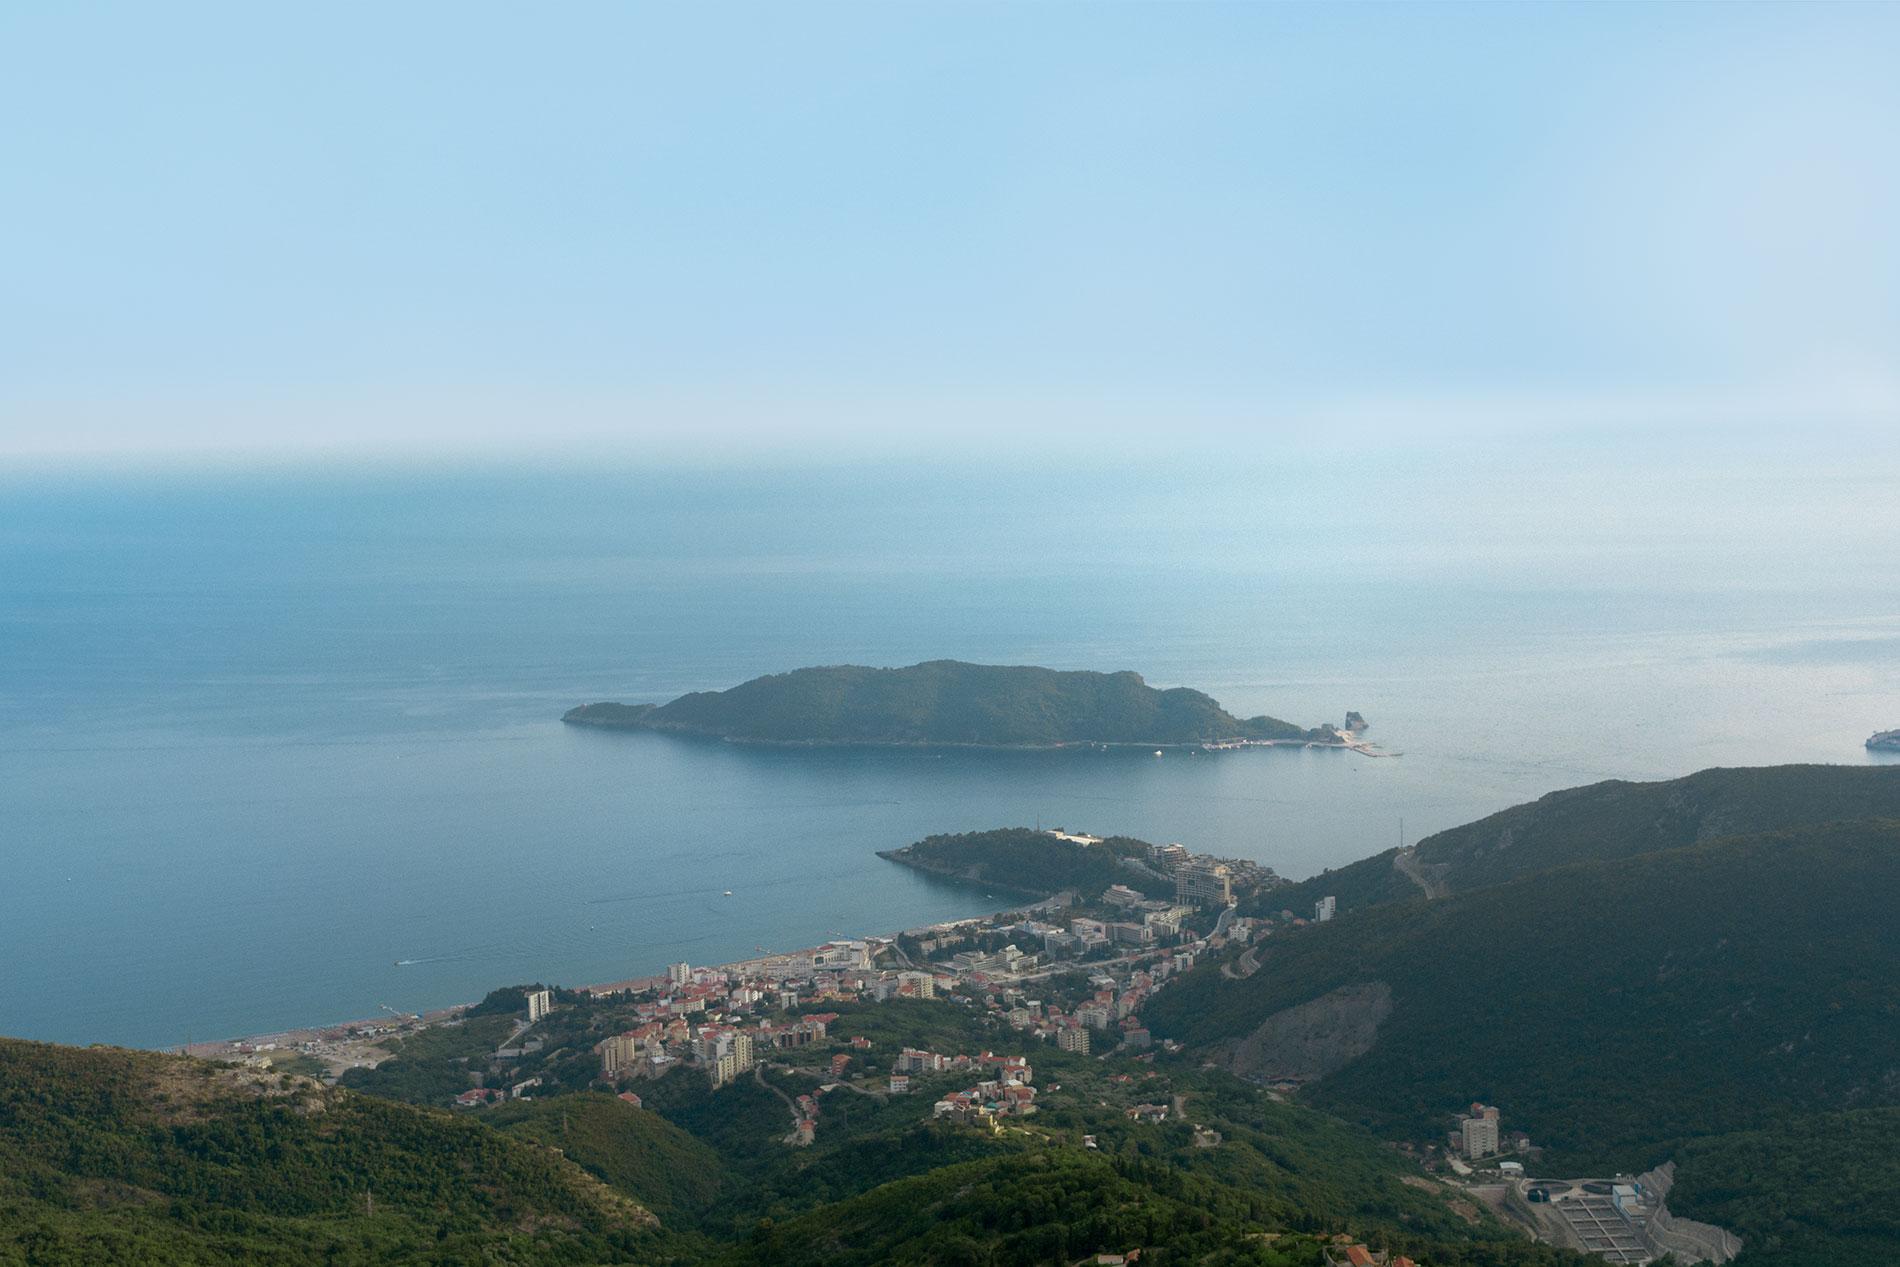 Vista de Budva no Montenegro